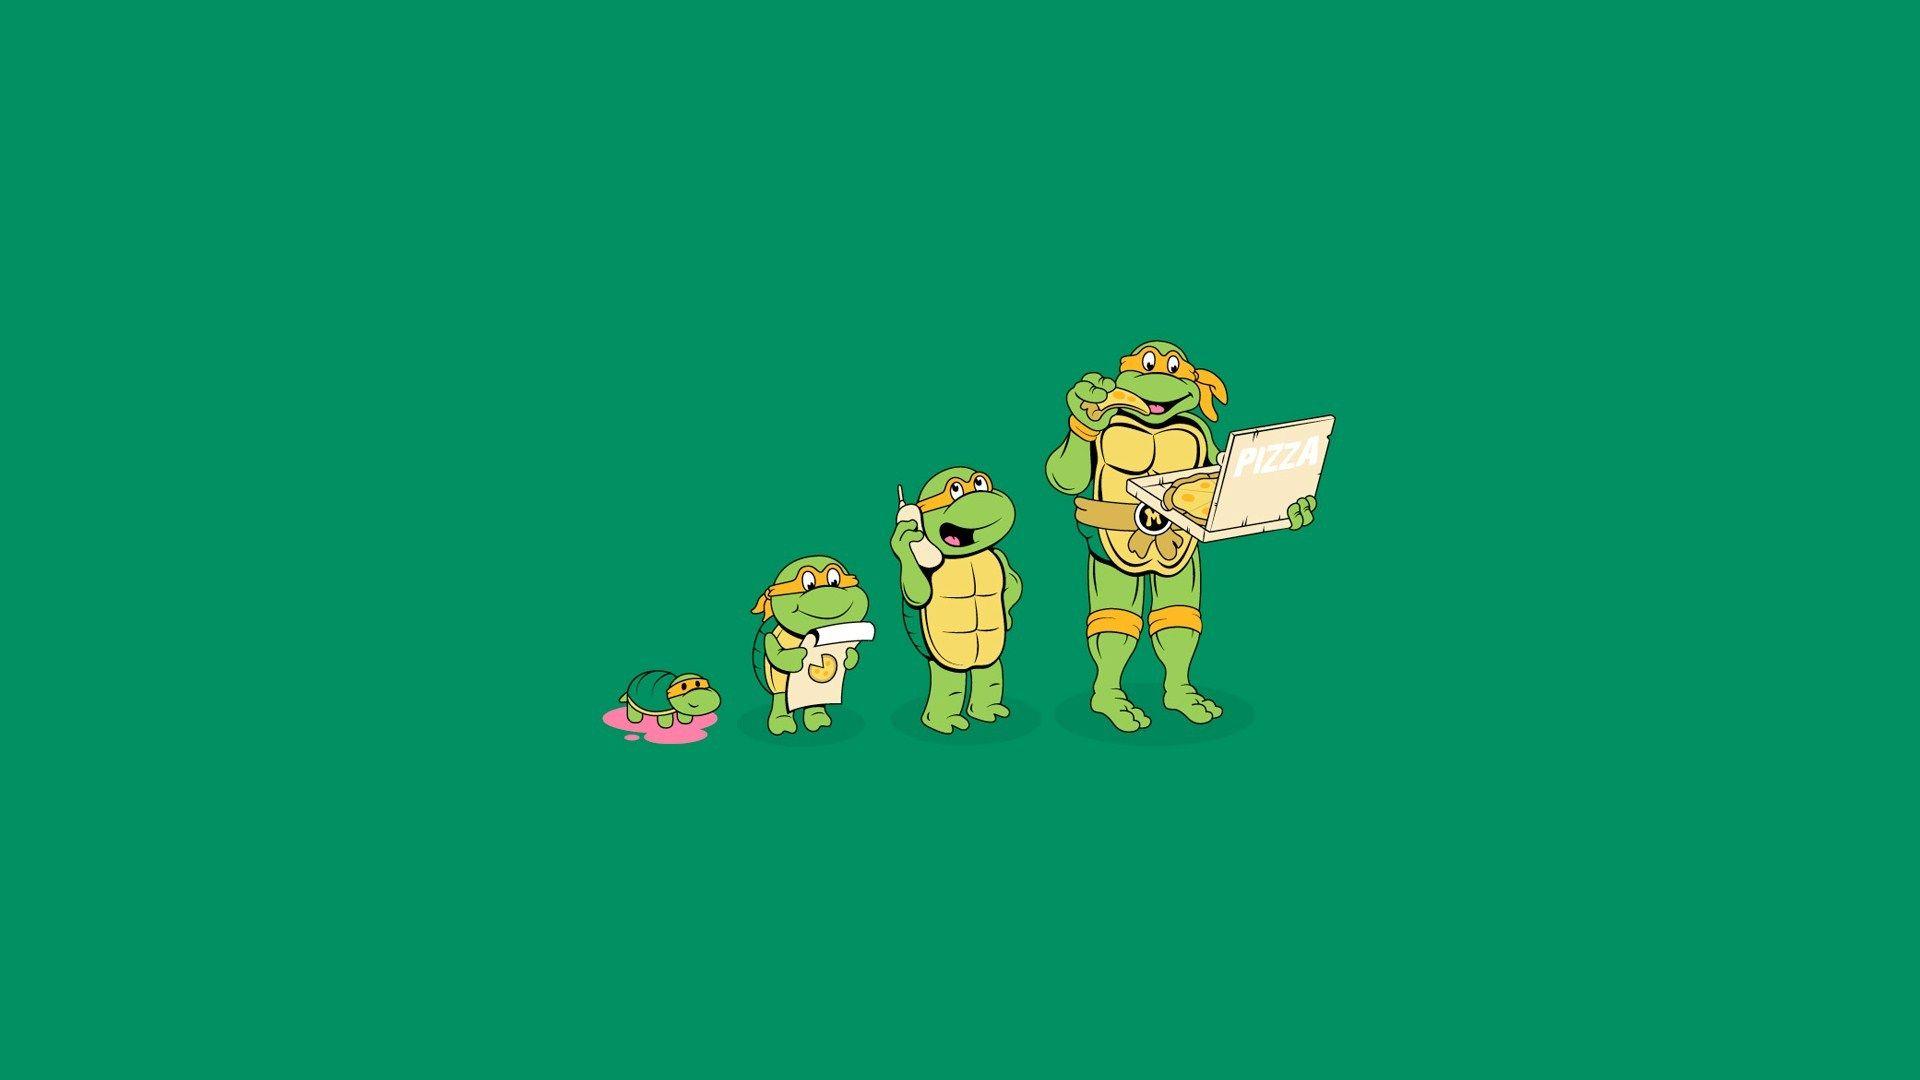 Teenage mutant ninja turtles hd wallpapers backgrounds hd teenage mutant ninja turtles hd wallpapers backgrounds hd wallpapers pinterest ninja turtles wallpaper and wallpaper backgrounds voltagebd Images